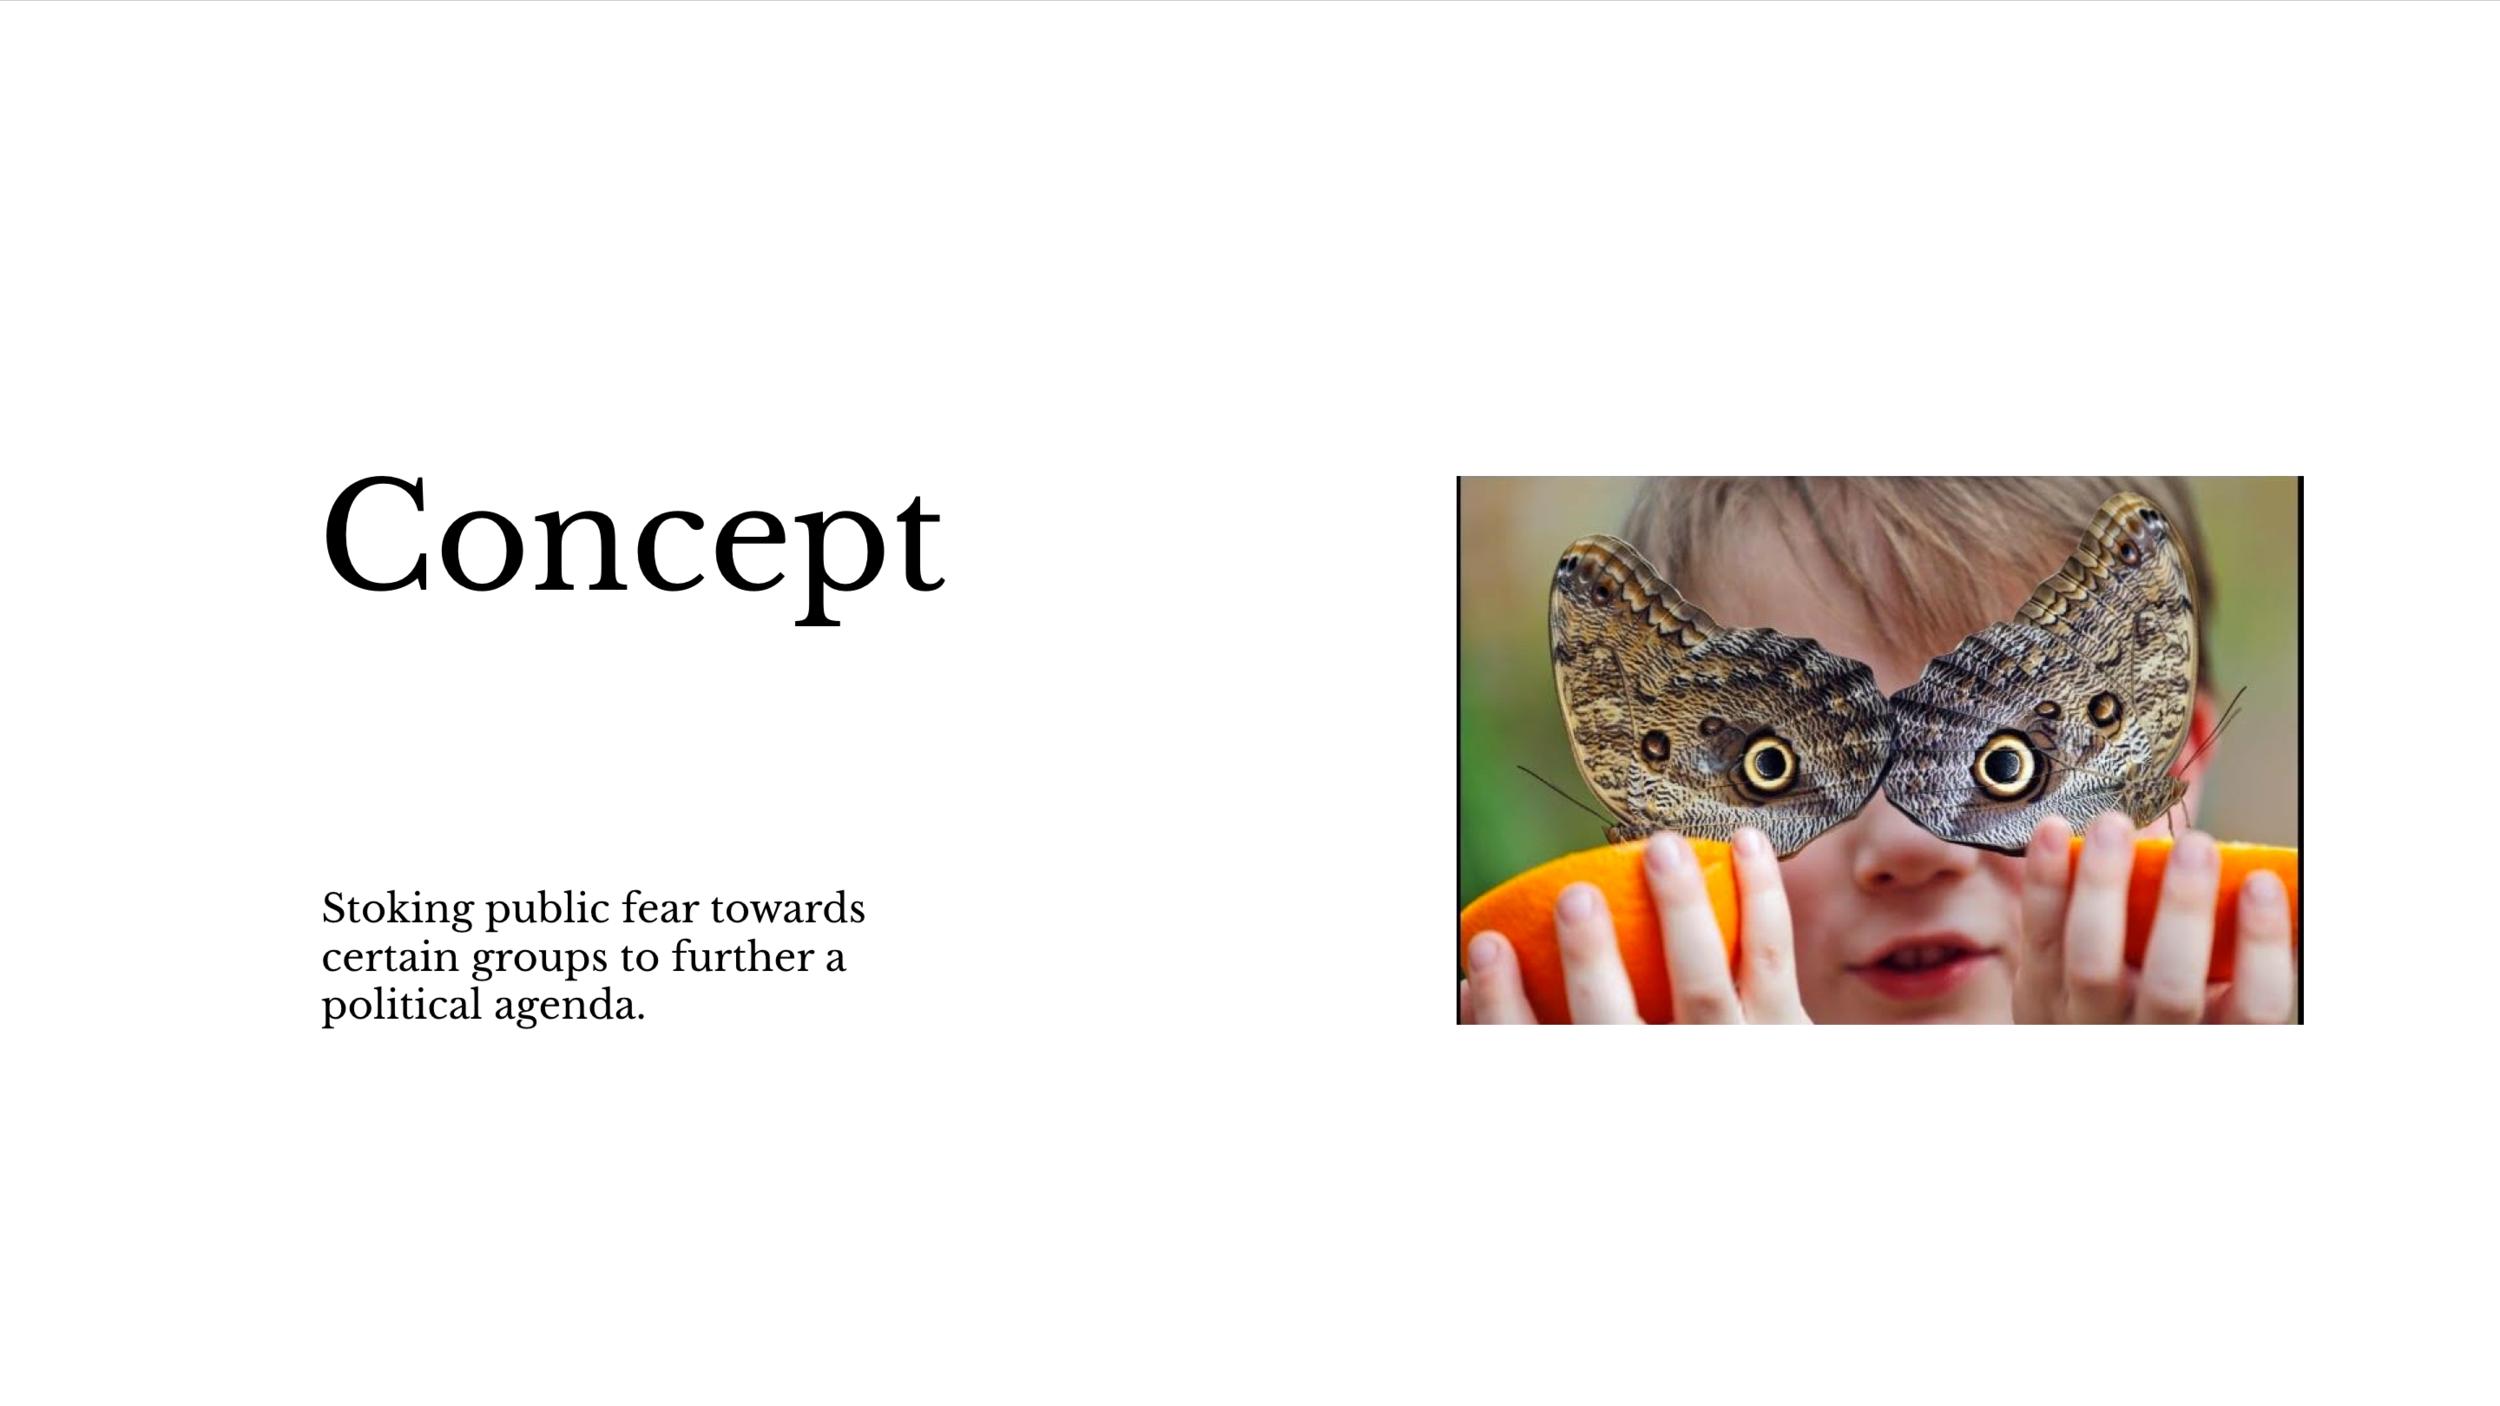 Schmetterling_process4.png